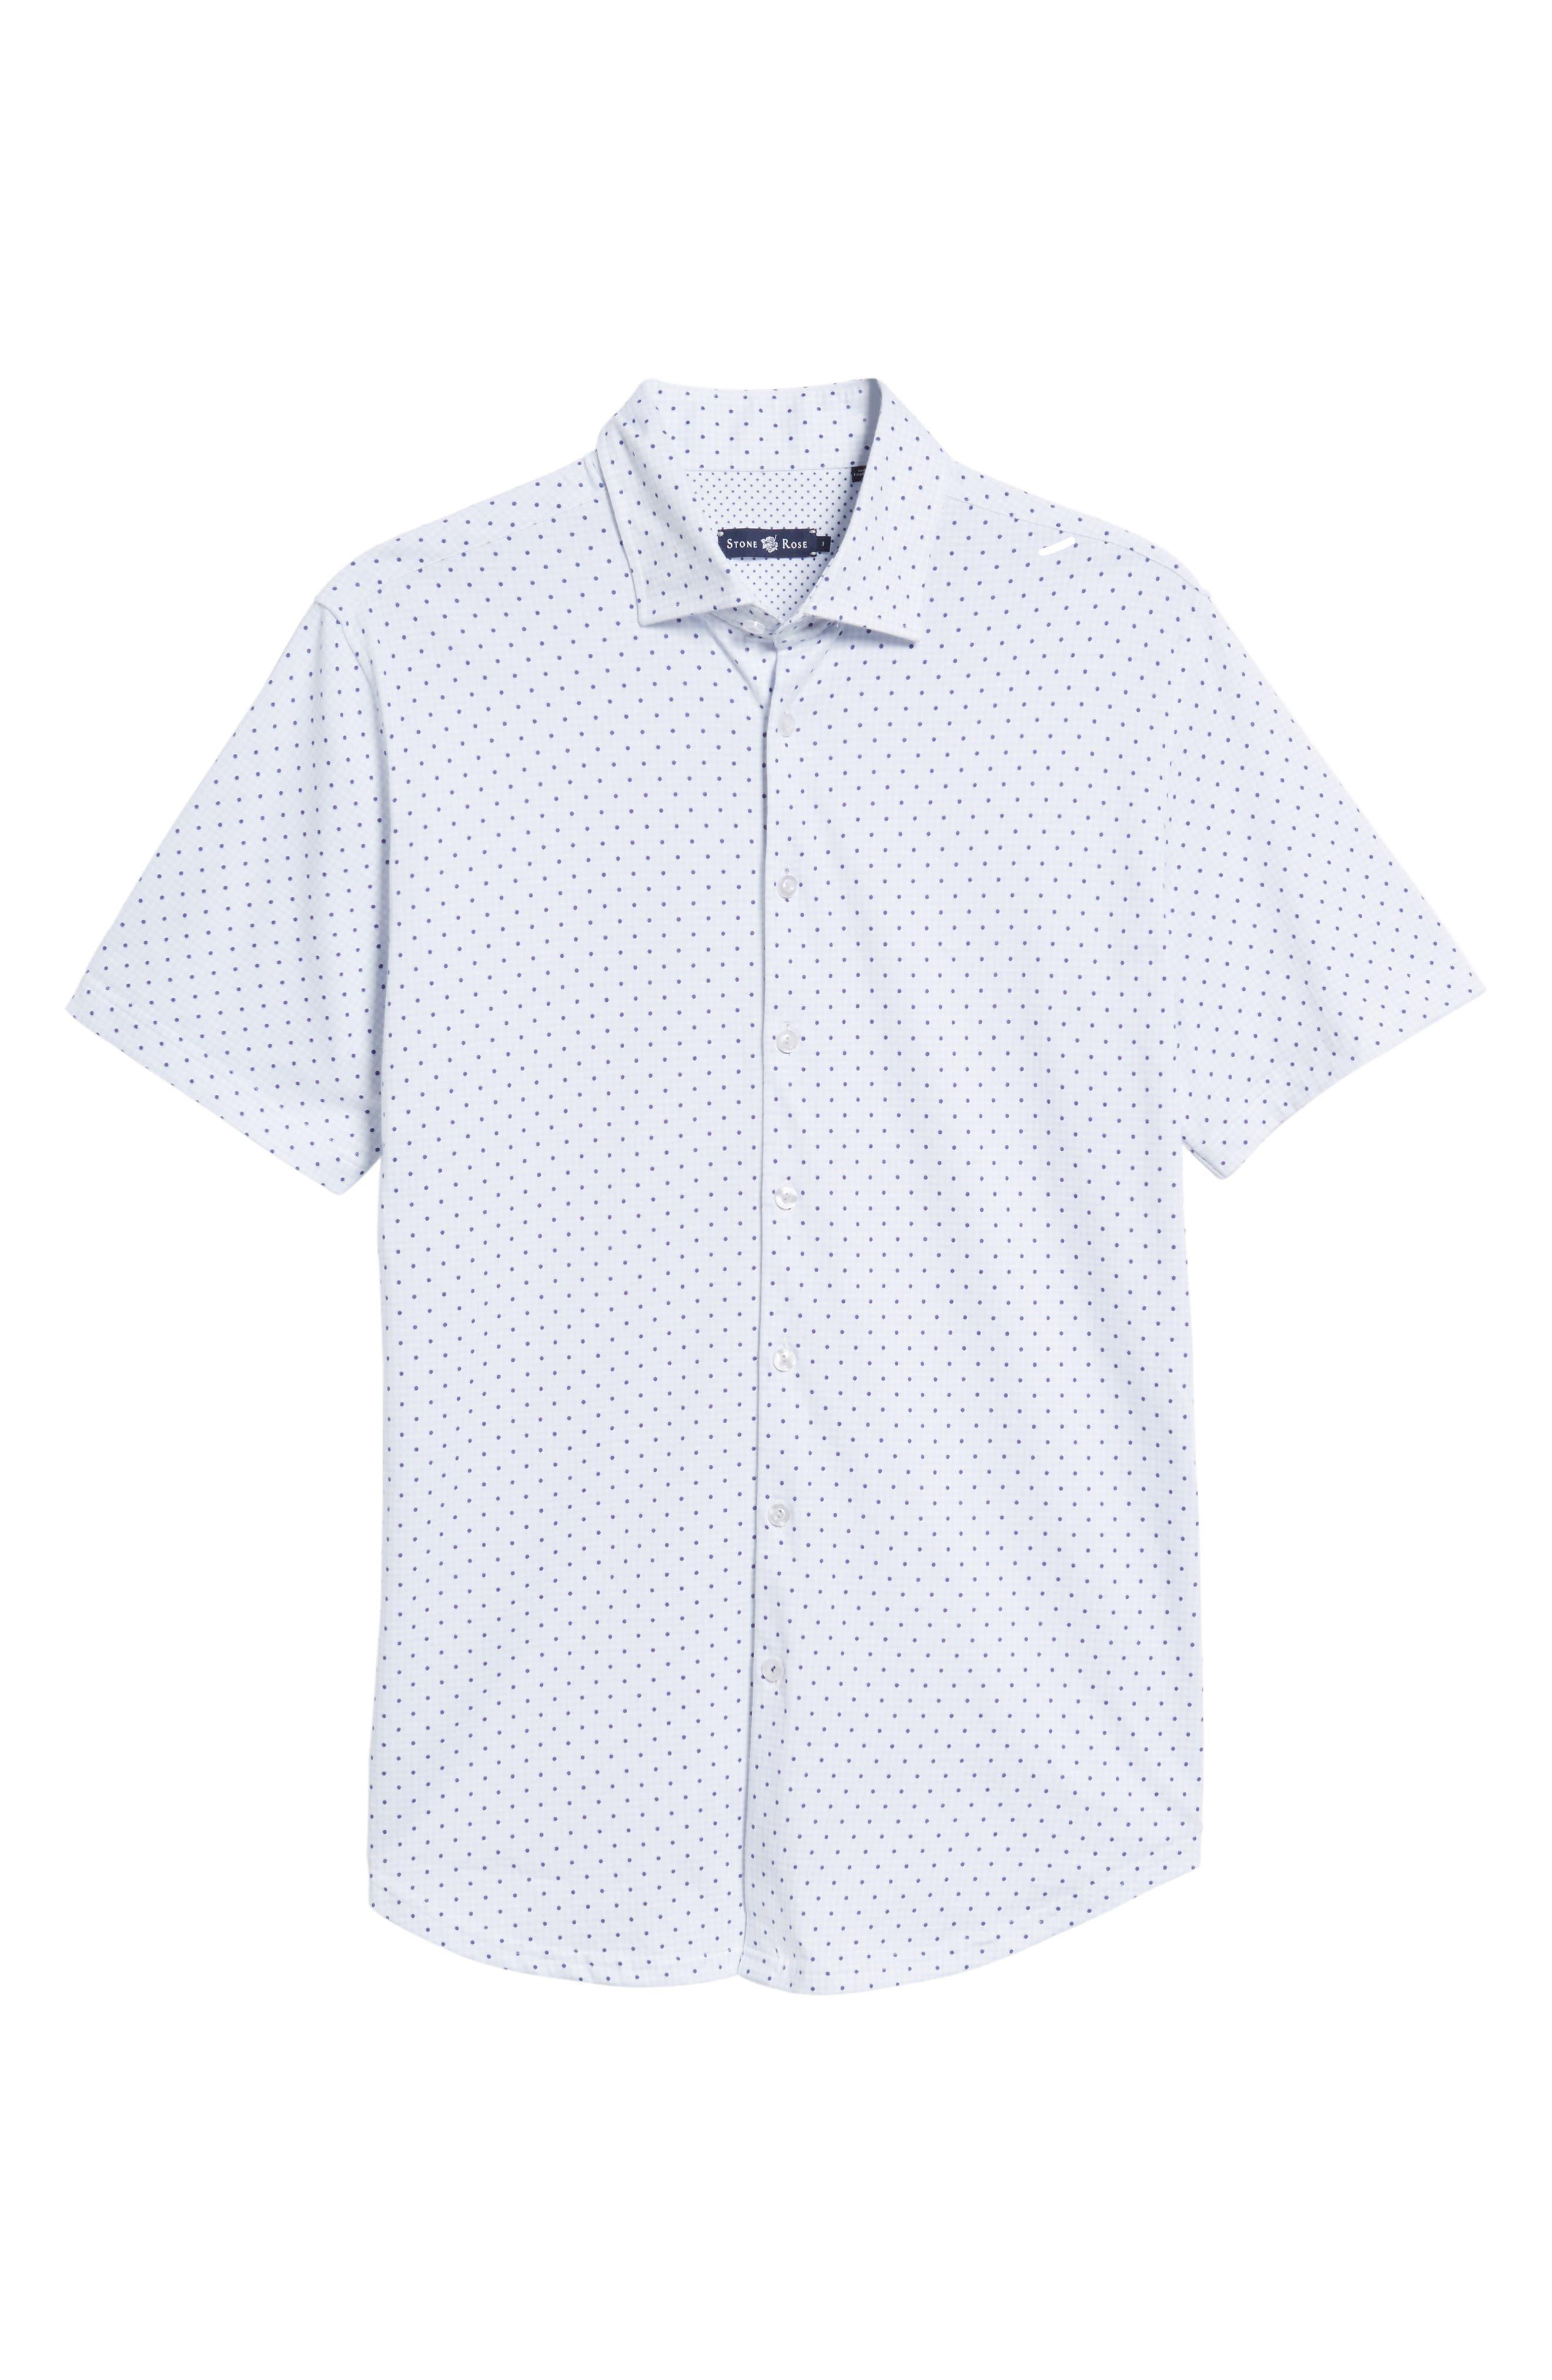 Trim Fit Polka Dot Check Sport Shirt,                             Alternate thumbnail 6, color,                             020